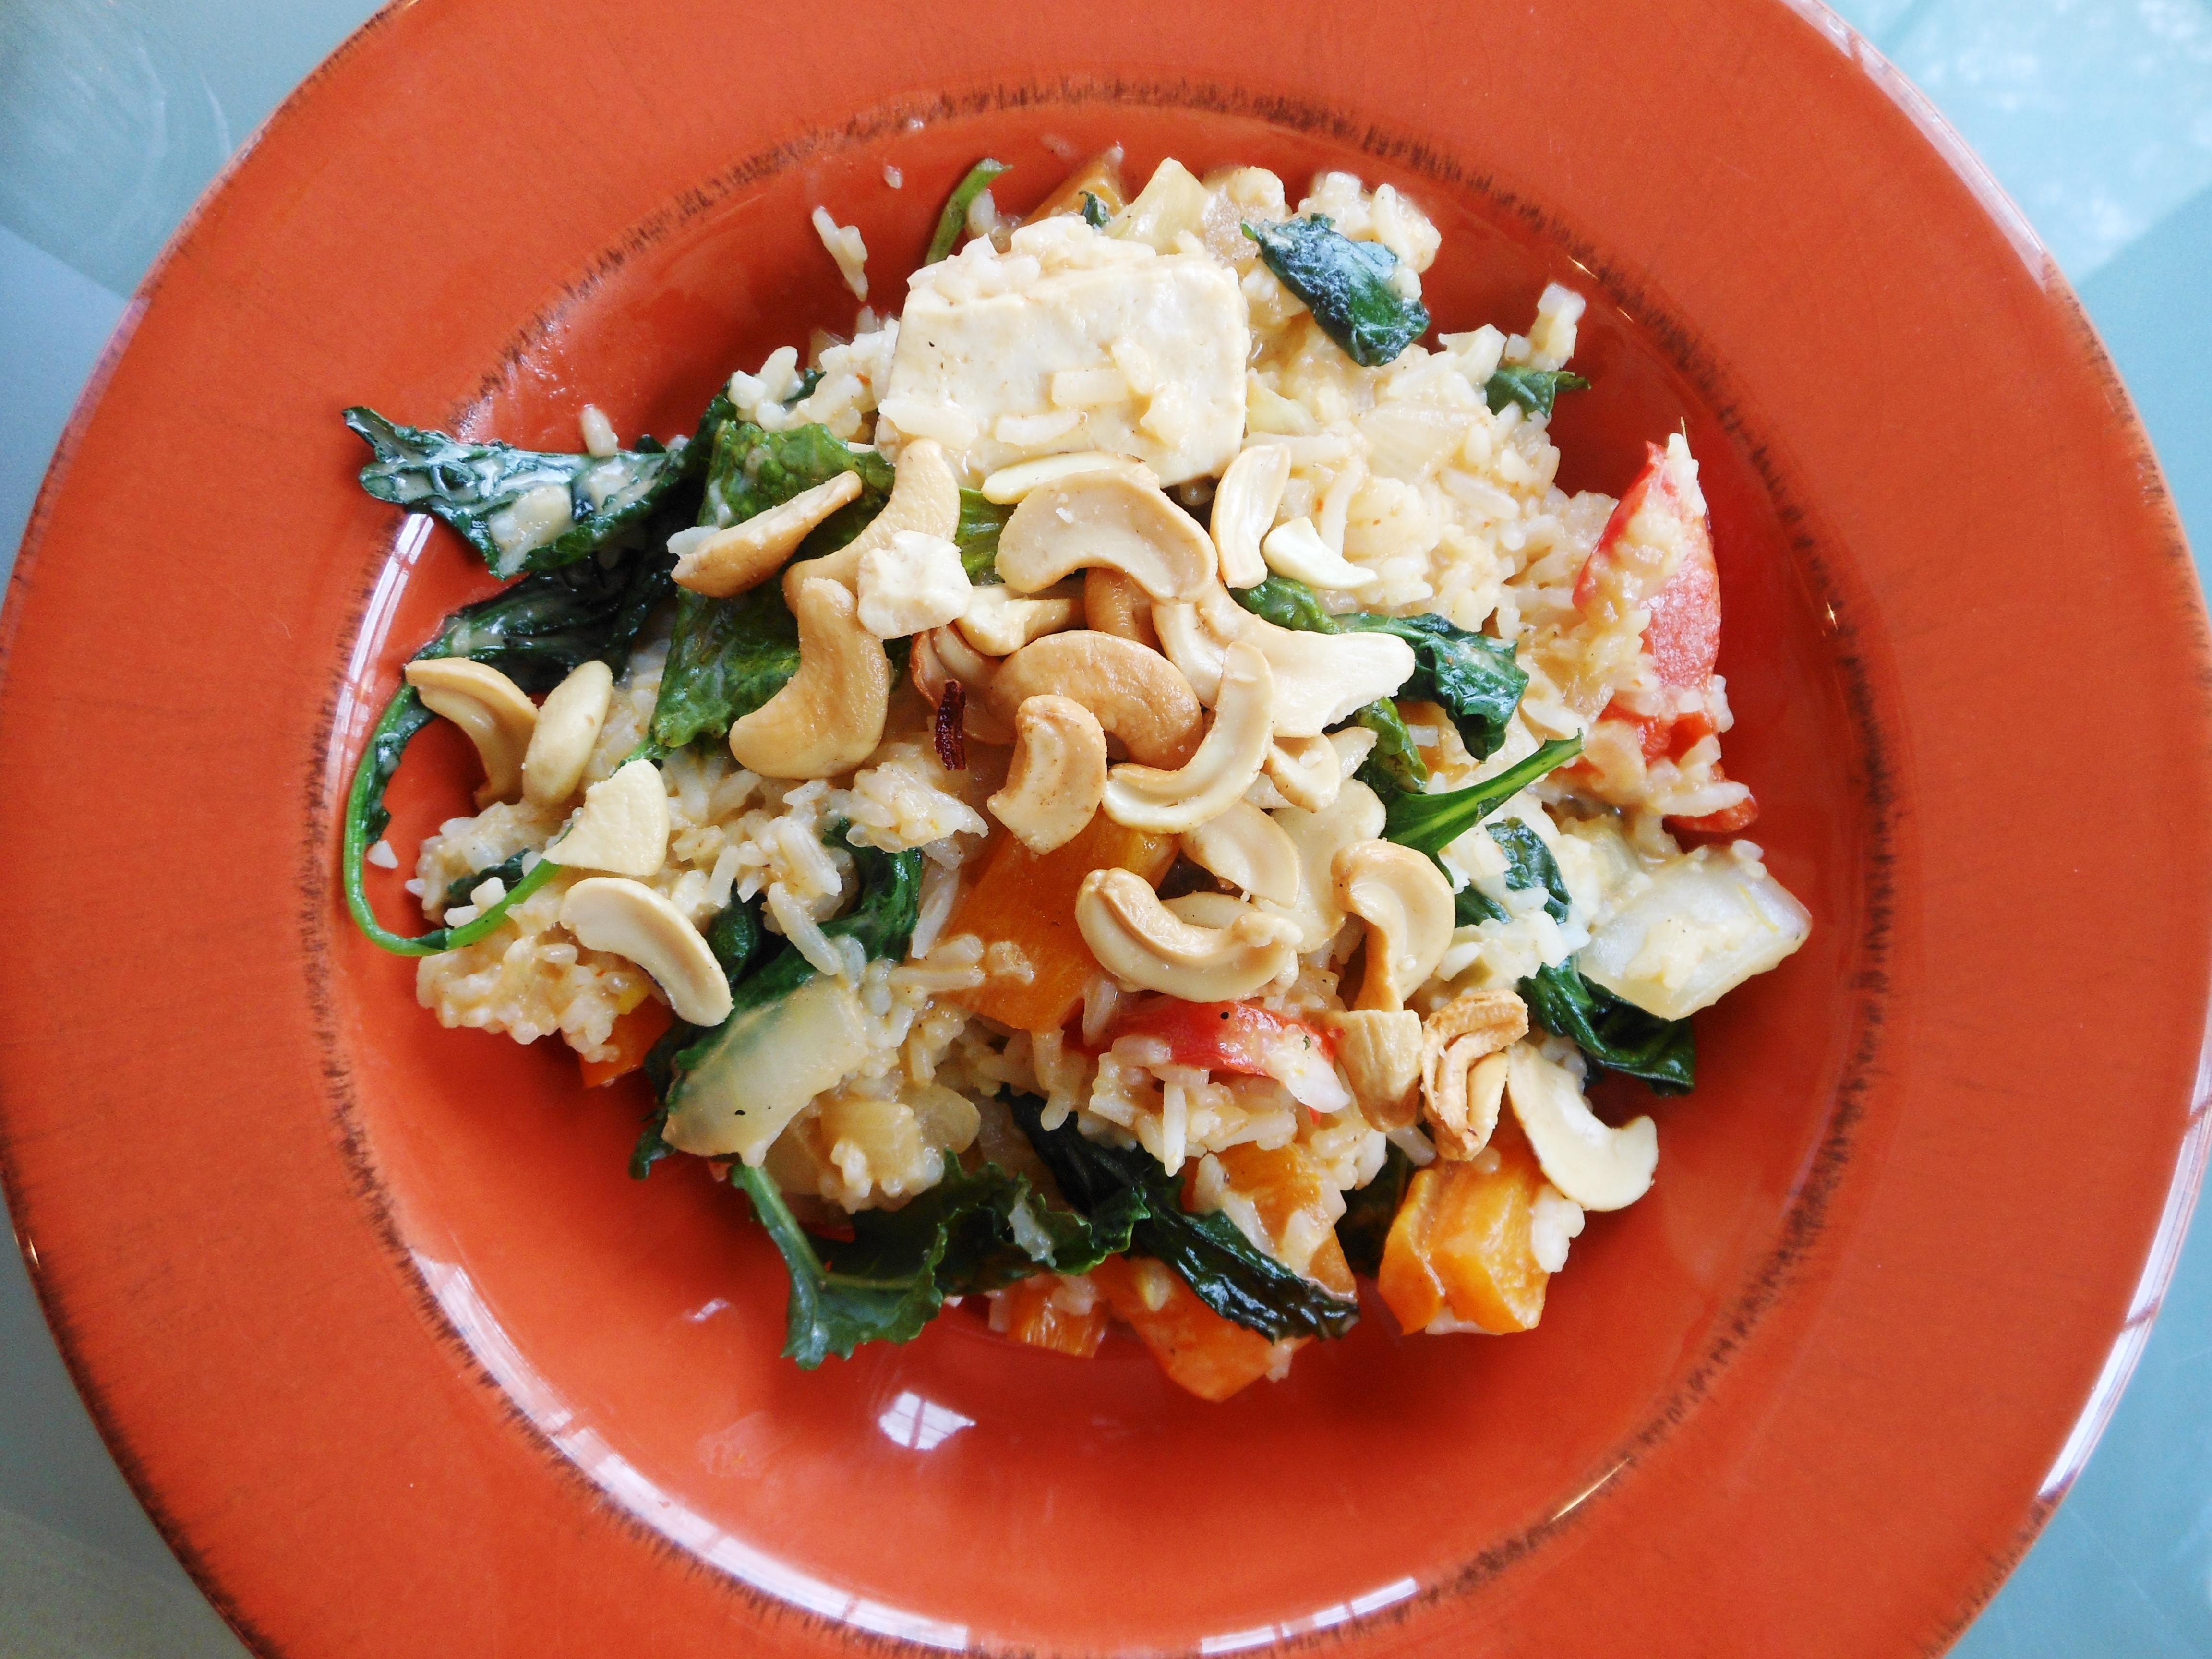 Vegan Thai Pumpkin And Tofu In Coconut Red Curry Saucea Restaurant